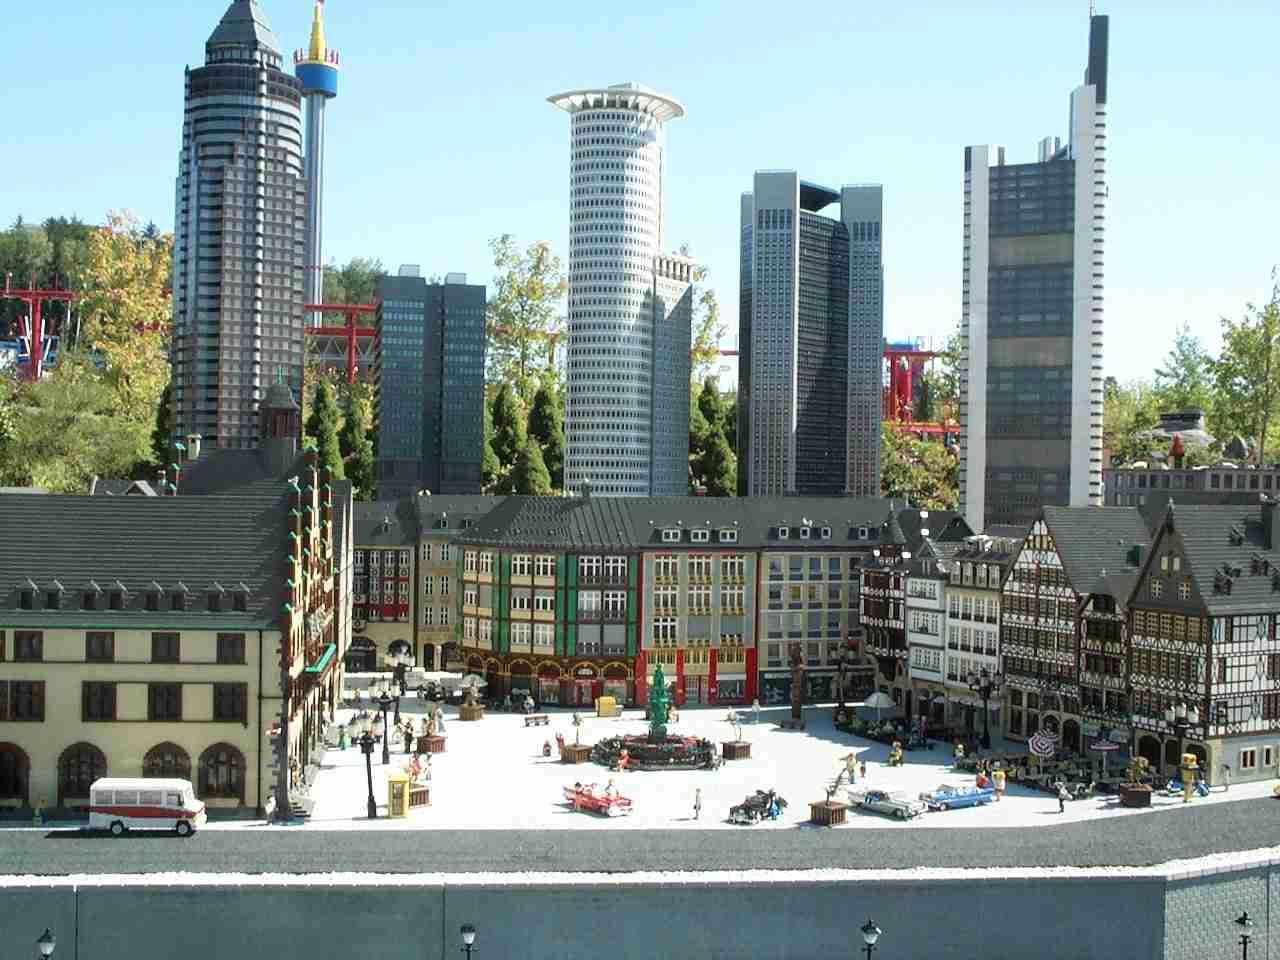 Fotografias Legoland